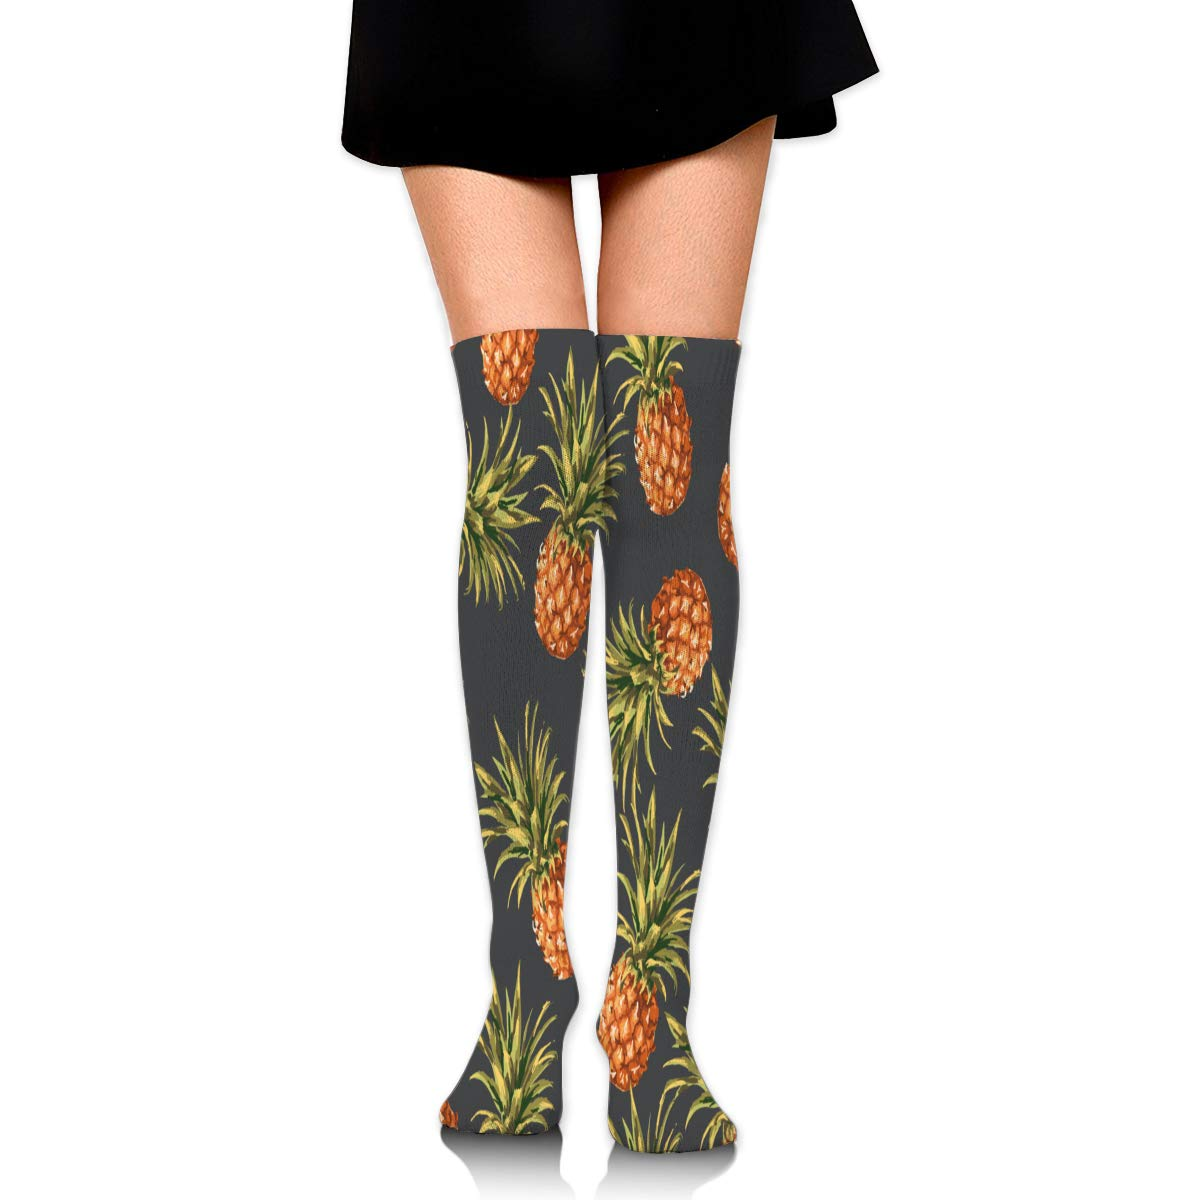 High Elasticity Girl Cotton Knee High Socks Uniform Funny Christmas Women Tube Socks